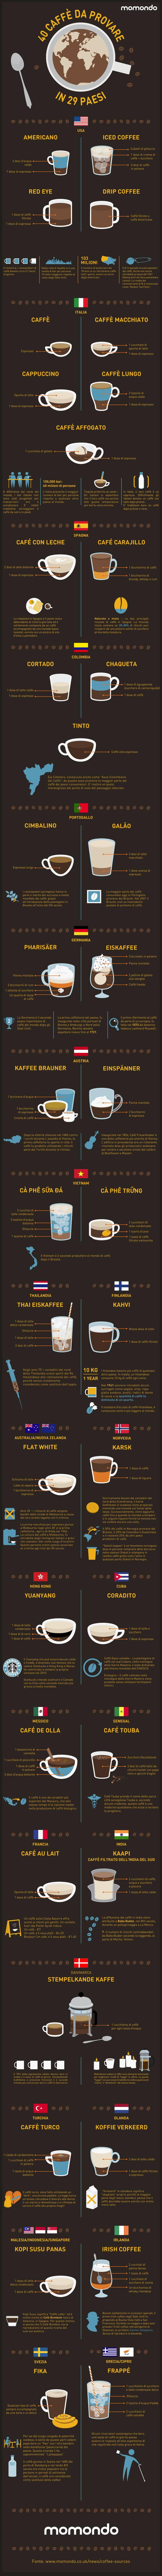 caffe-nel-mondo-infografica-momondo-small